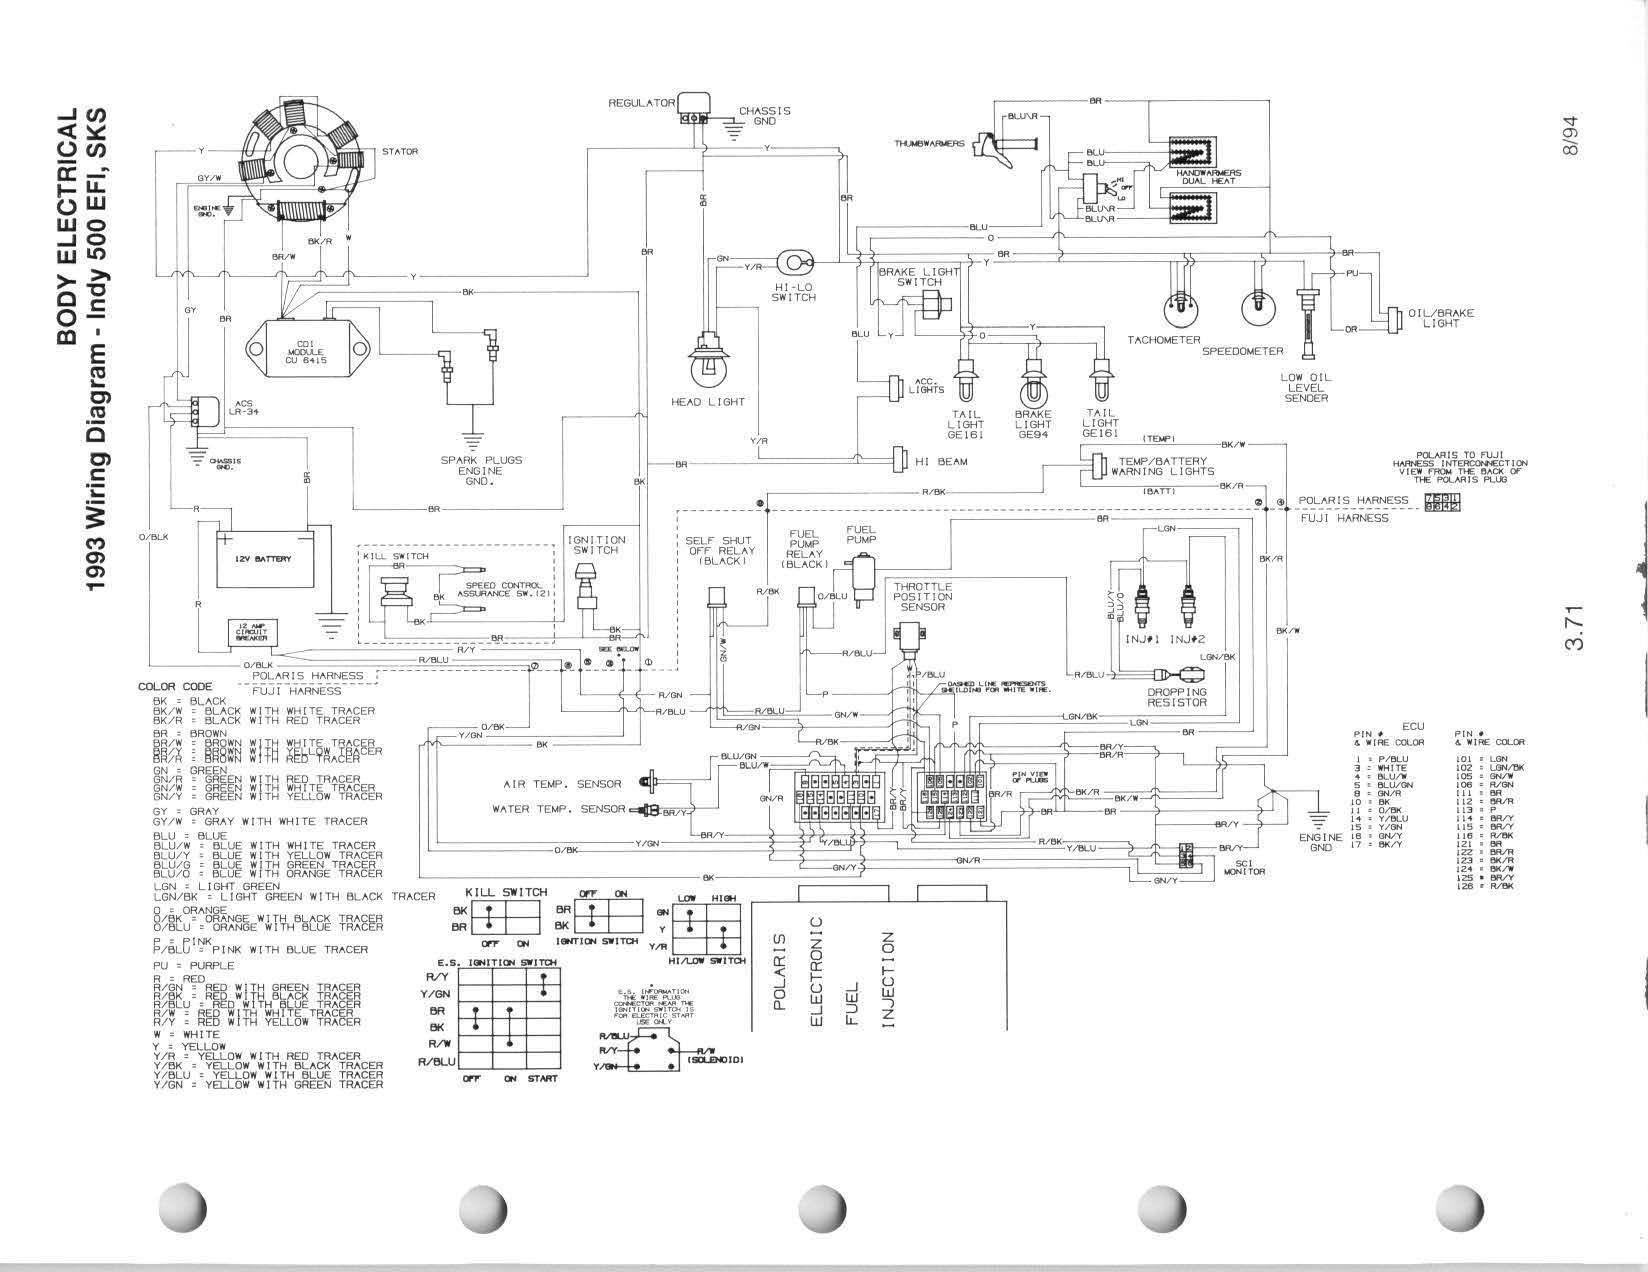 2011 Polaris Wiring Diagram Fuse Box Diagram 2001 Chevy Silverado Cheerokee Karo Wong Liyo Jeanjaures37 Fr